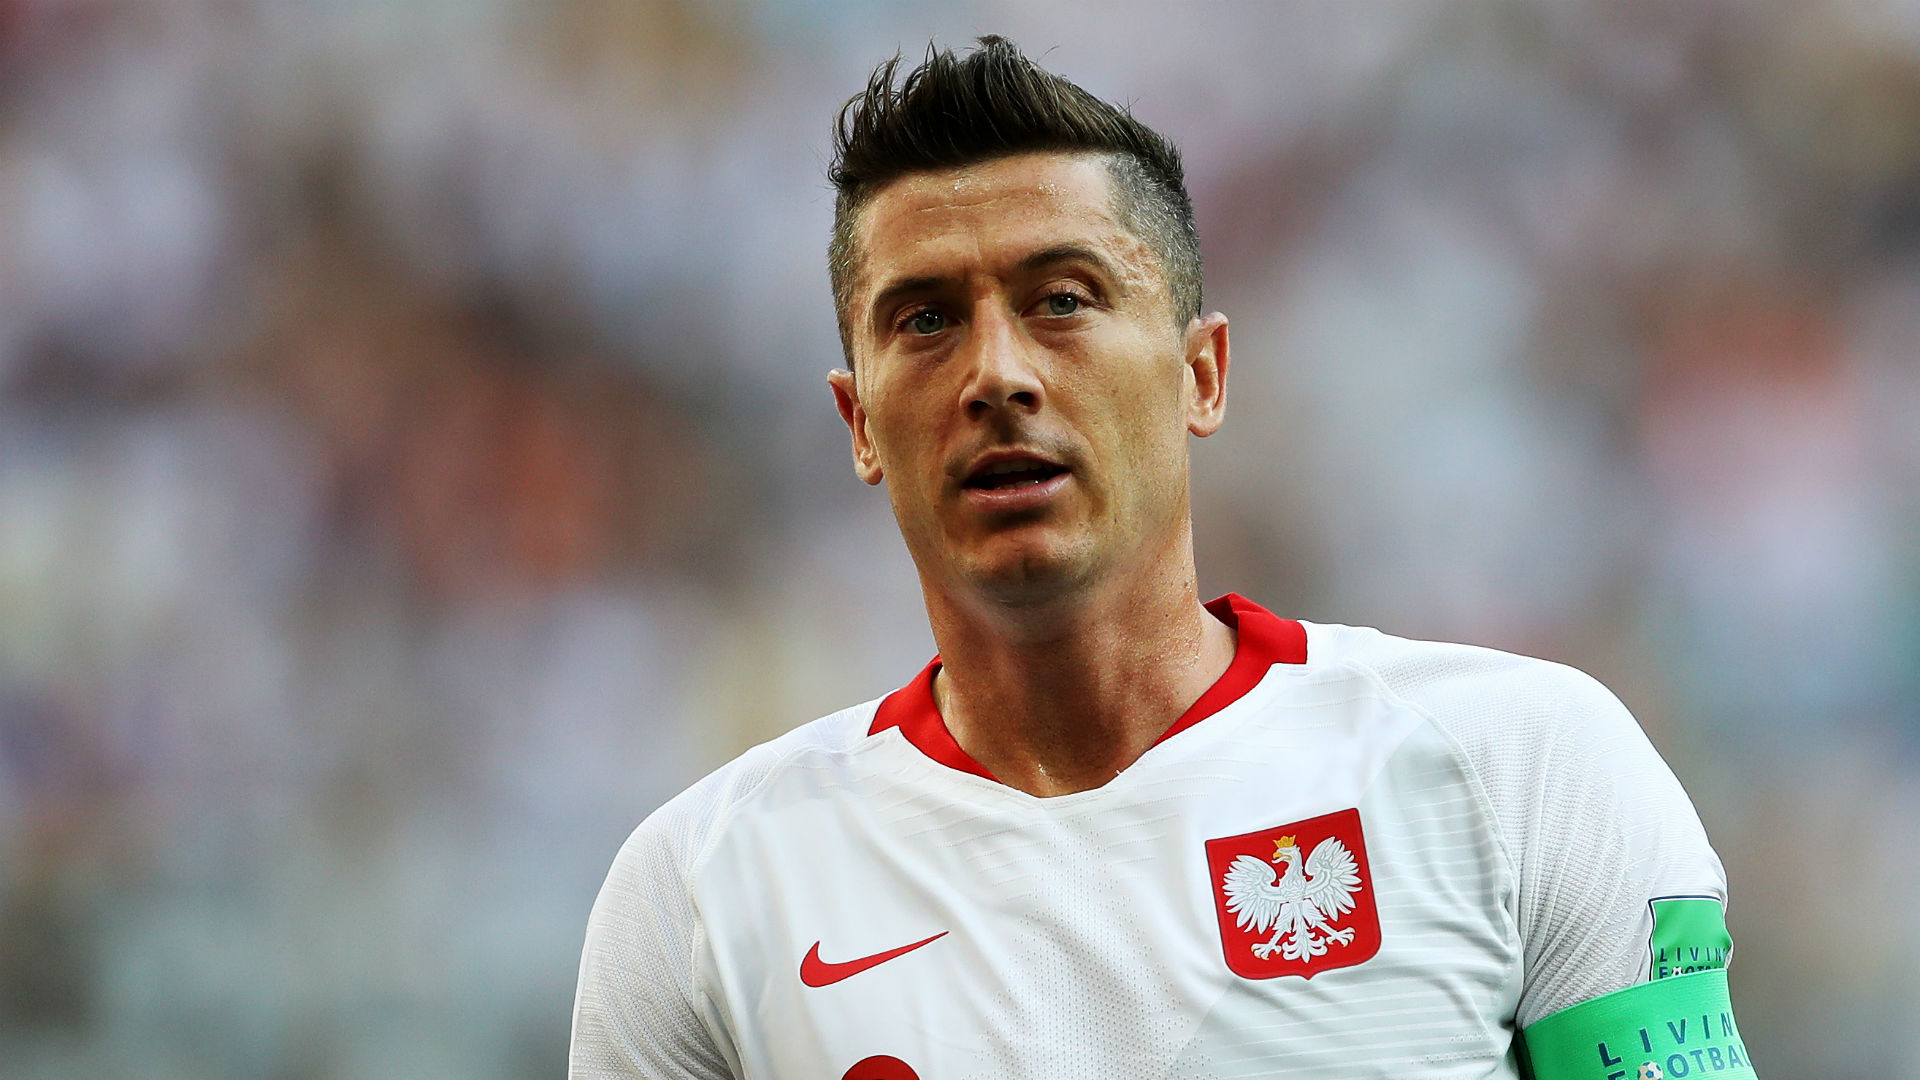 Lewandowski to miss England clash